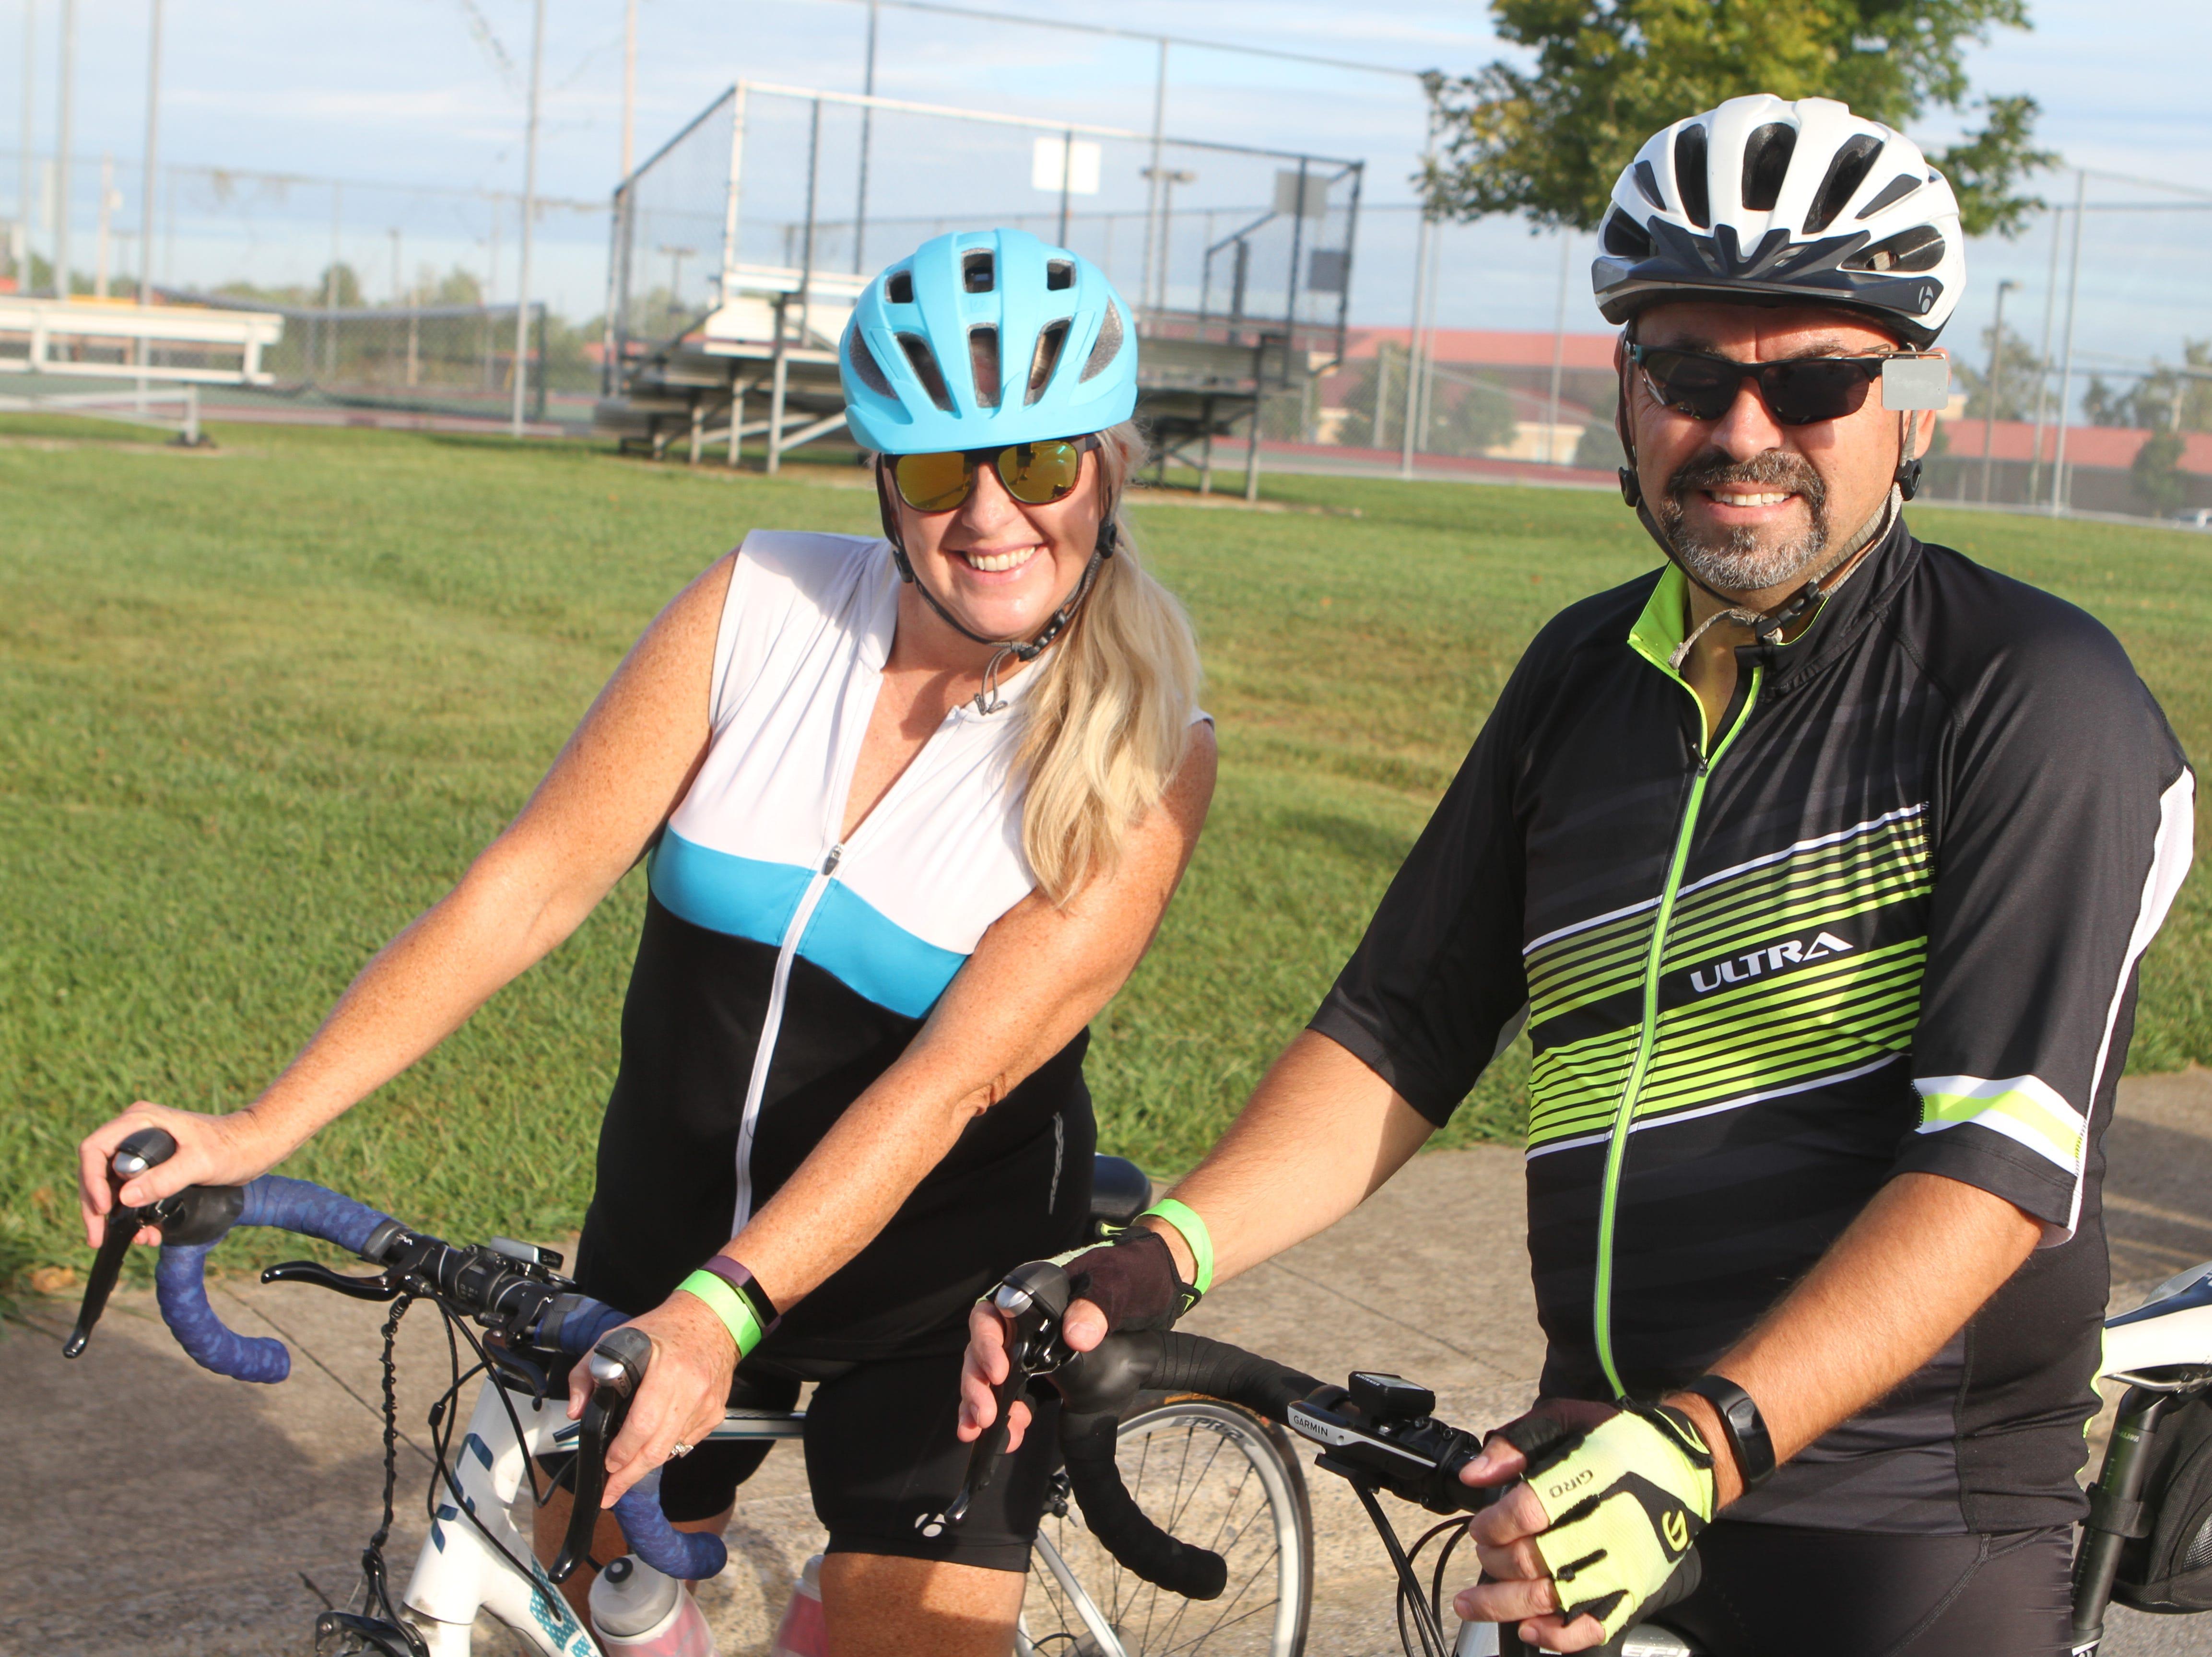 Anita Long and Tim Barker line up at the Sunrise Century Bike Ride Saturday.